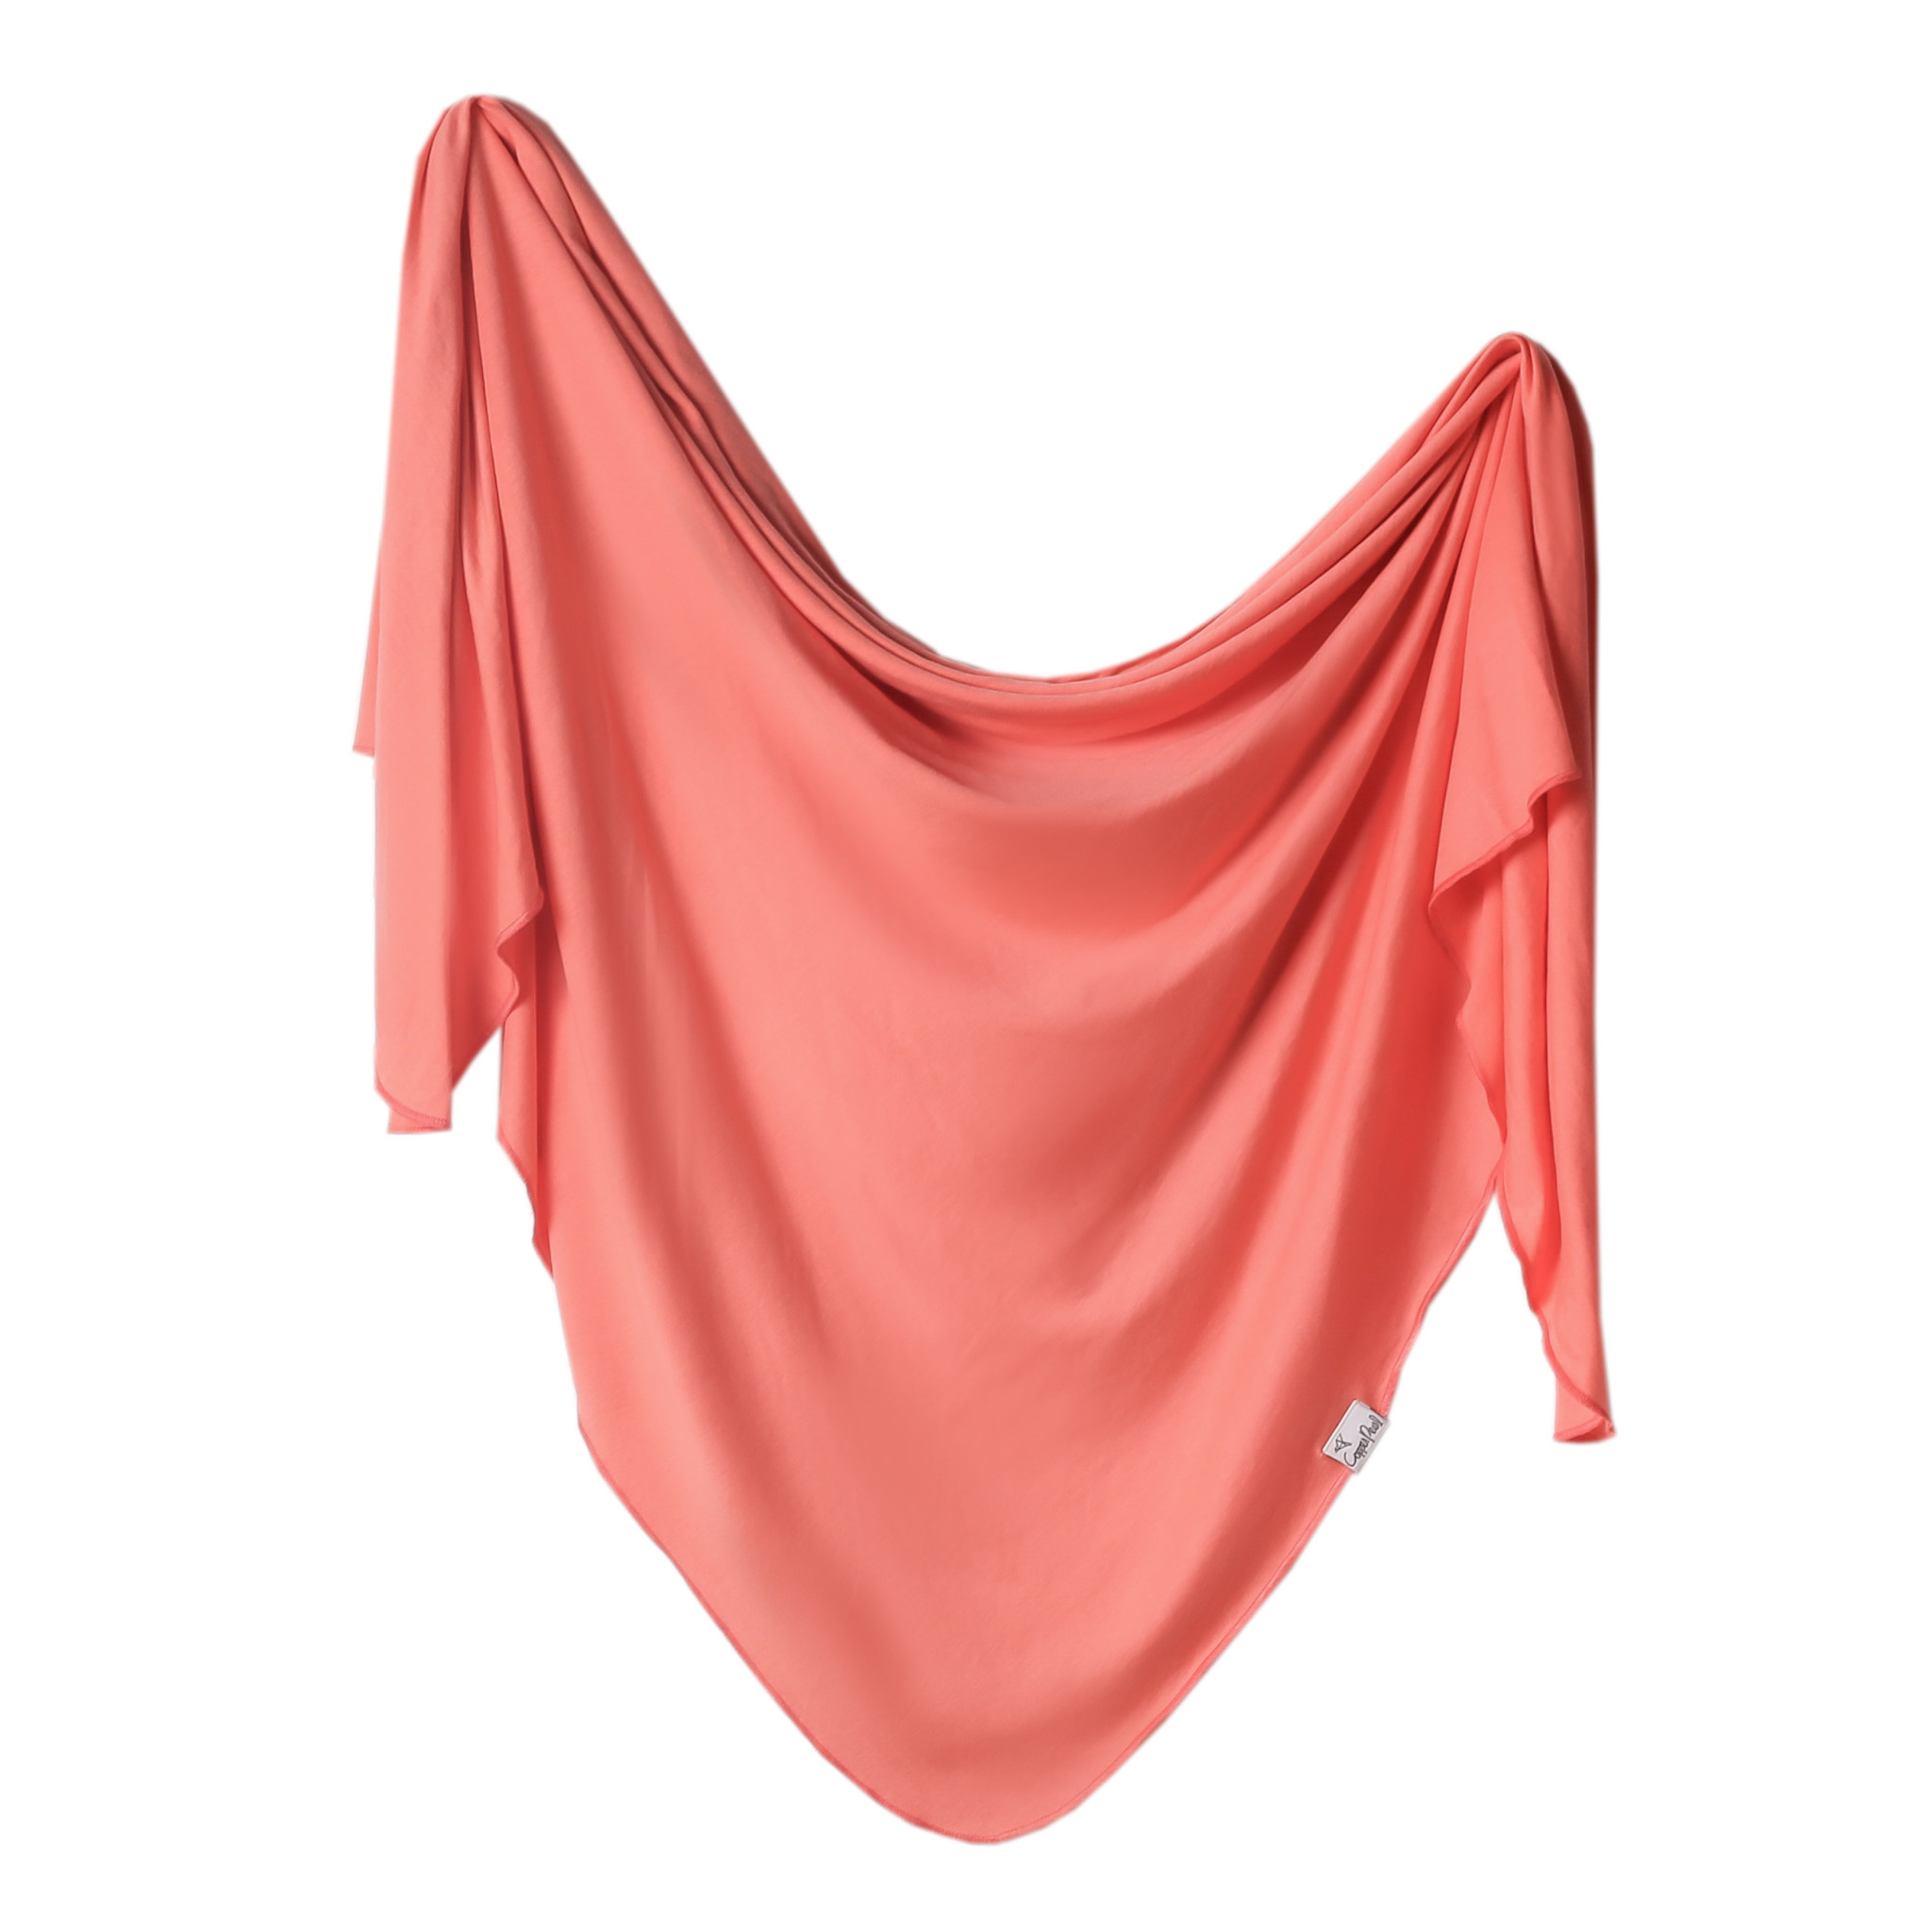 Copper Pearl Knit Swaddle Blanket Stella